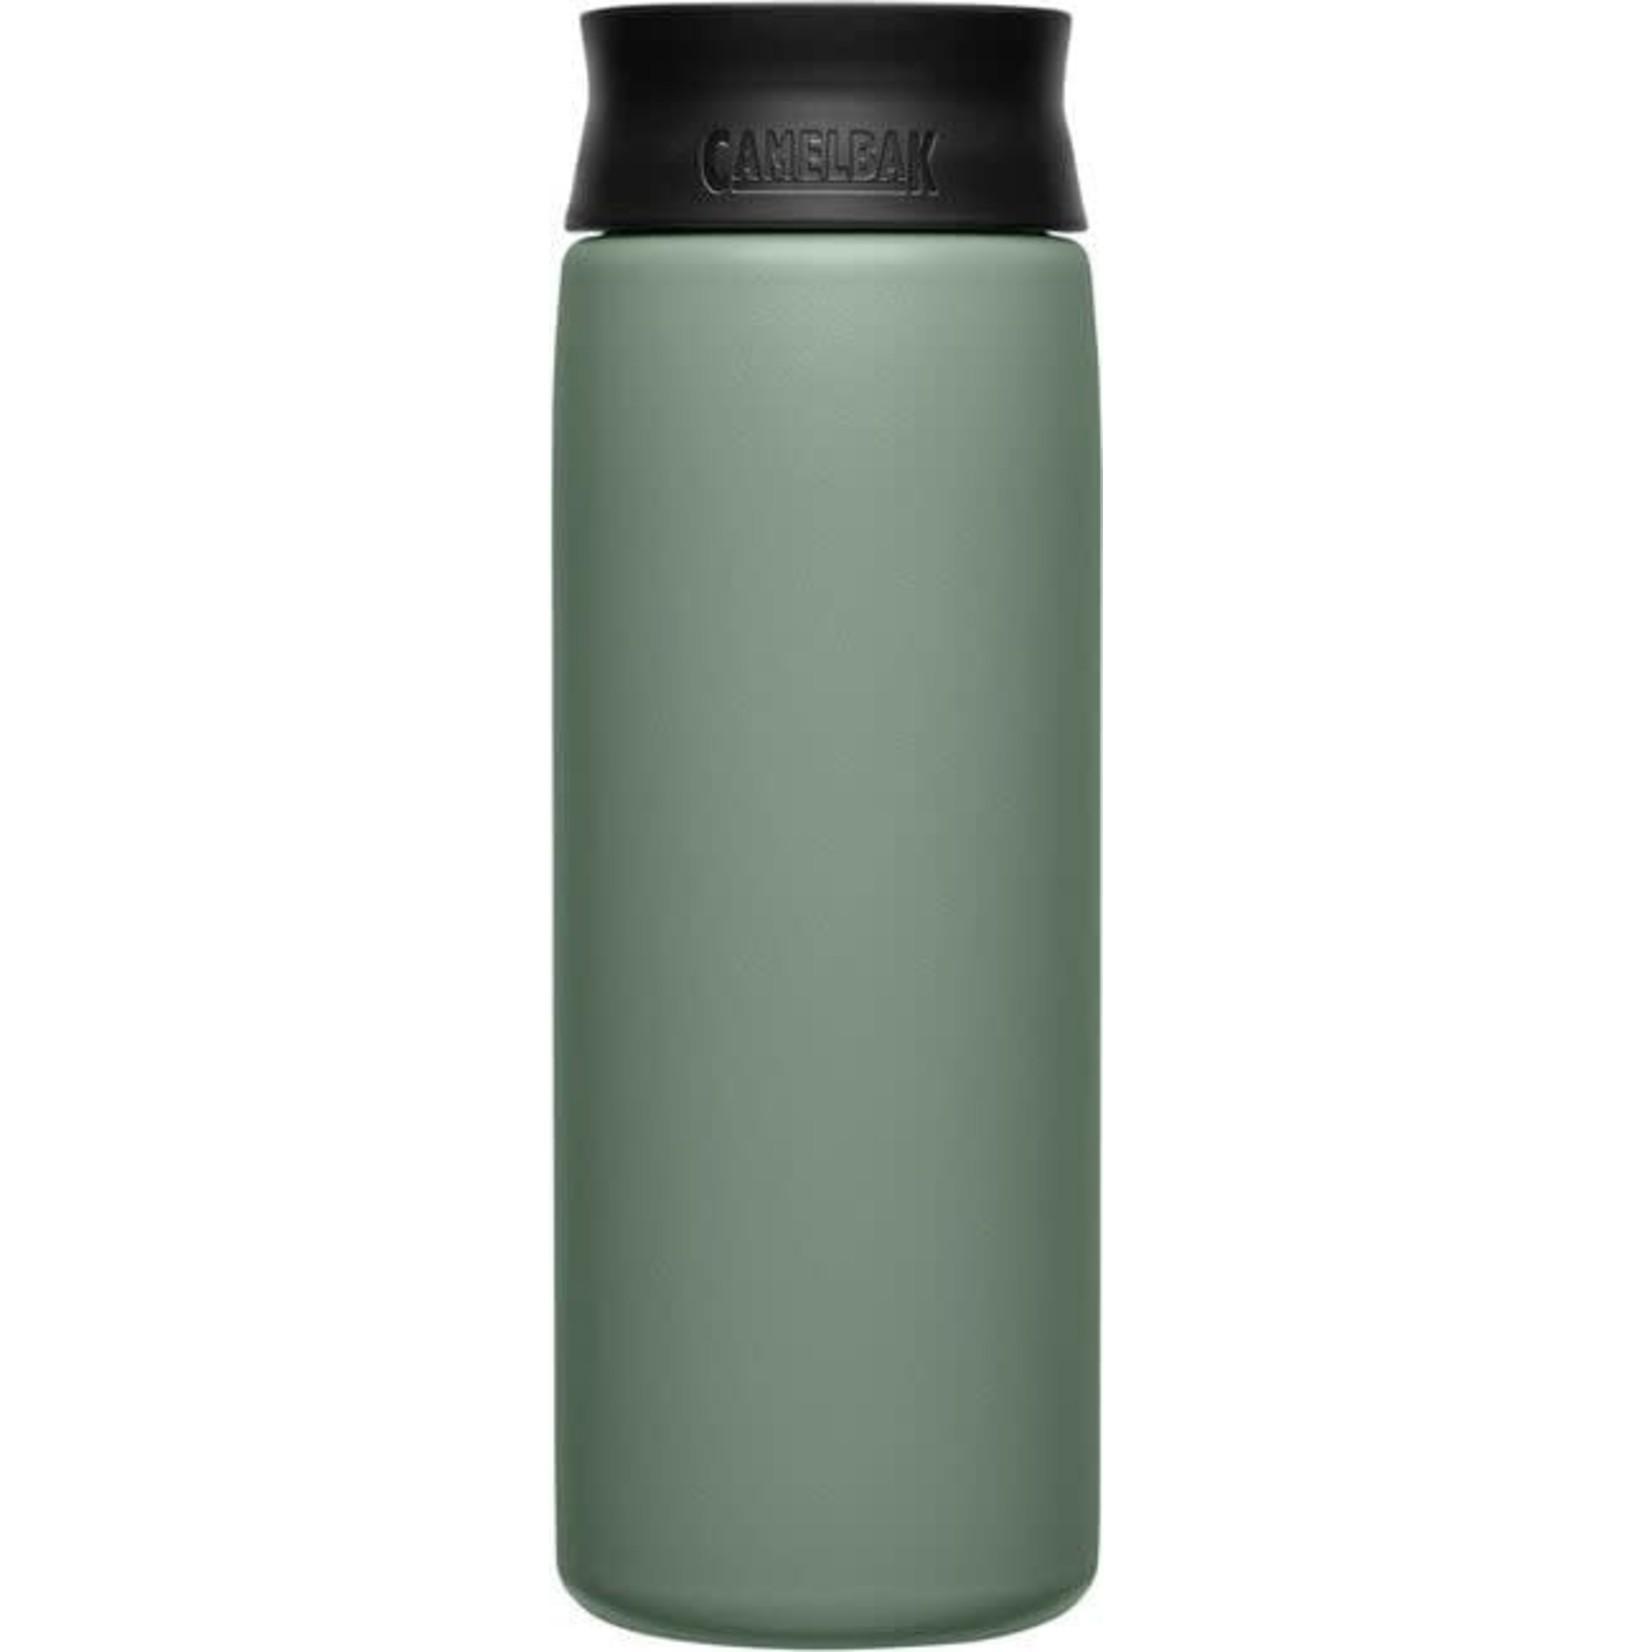 CAMELBAK Camelbak Hot Cap, Vacuum Insulated Stainless Steel